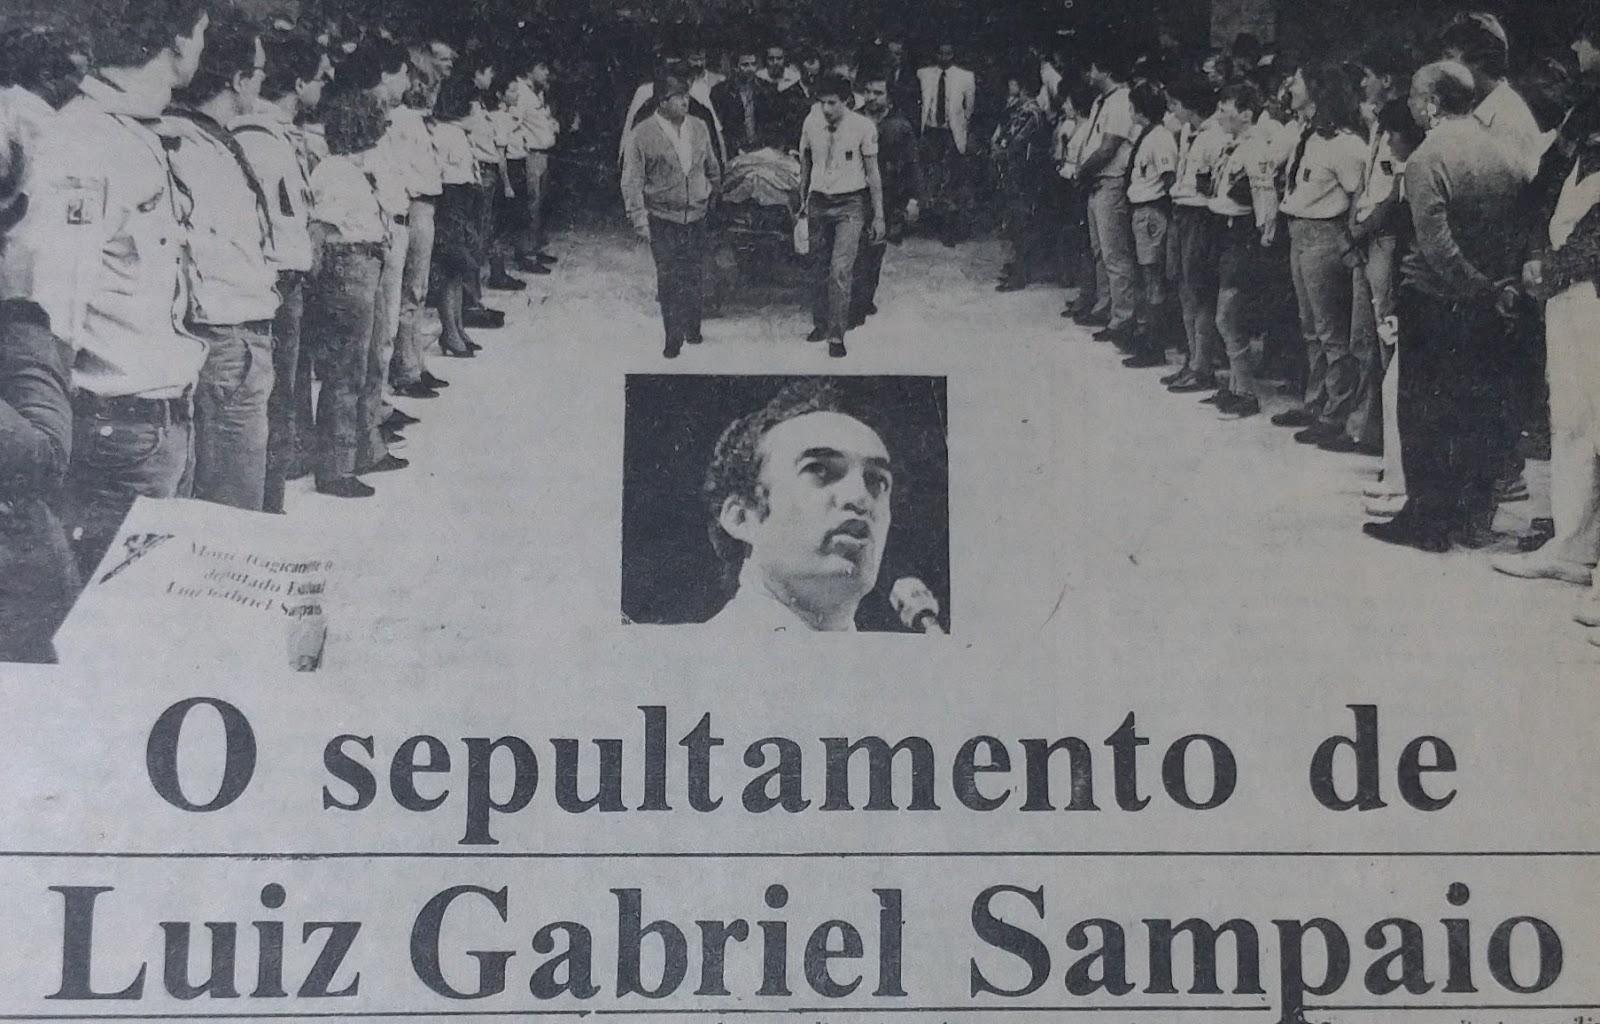 Morte de Luiz Gabriel Sampaio - Dezembro de 1983